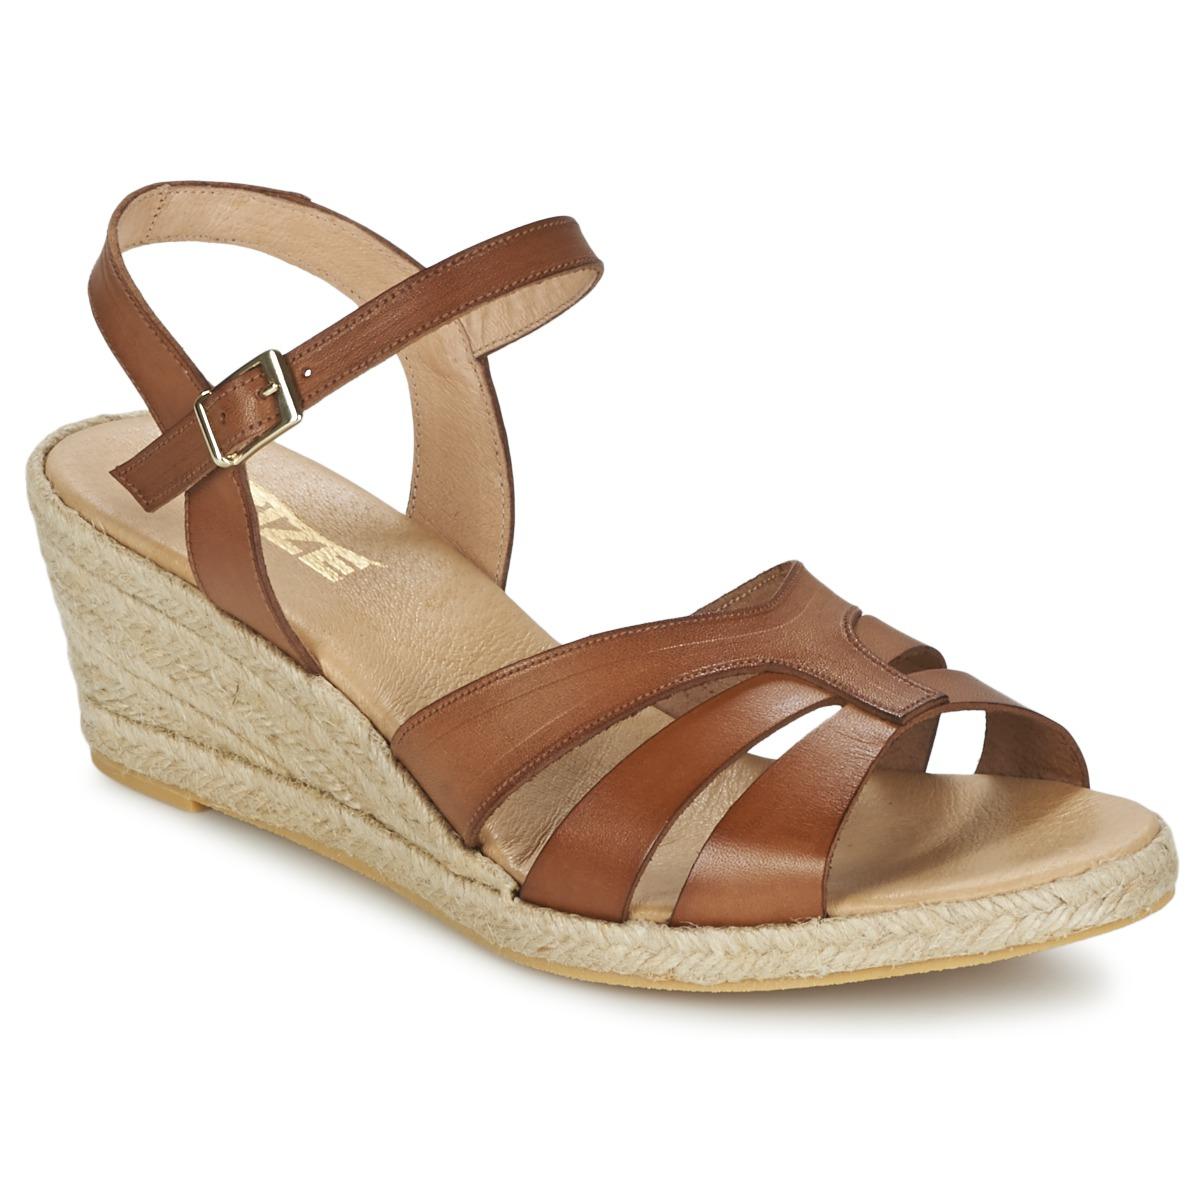 Sandale So Size ELIZA Marron